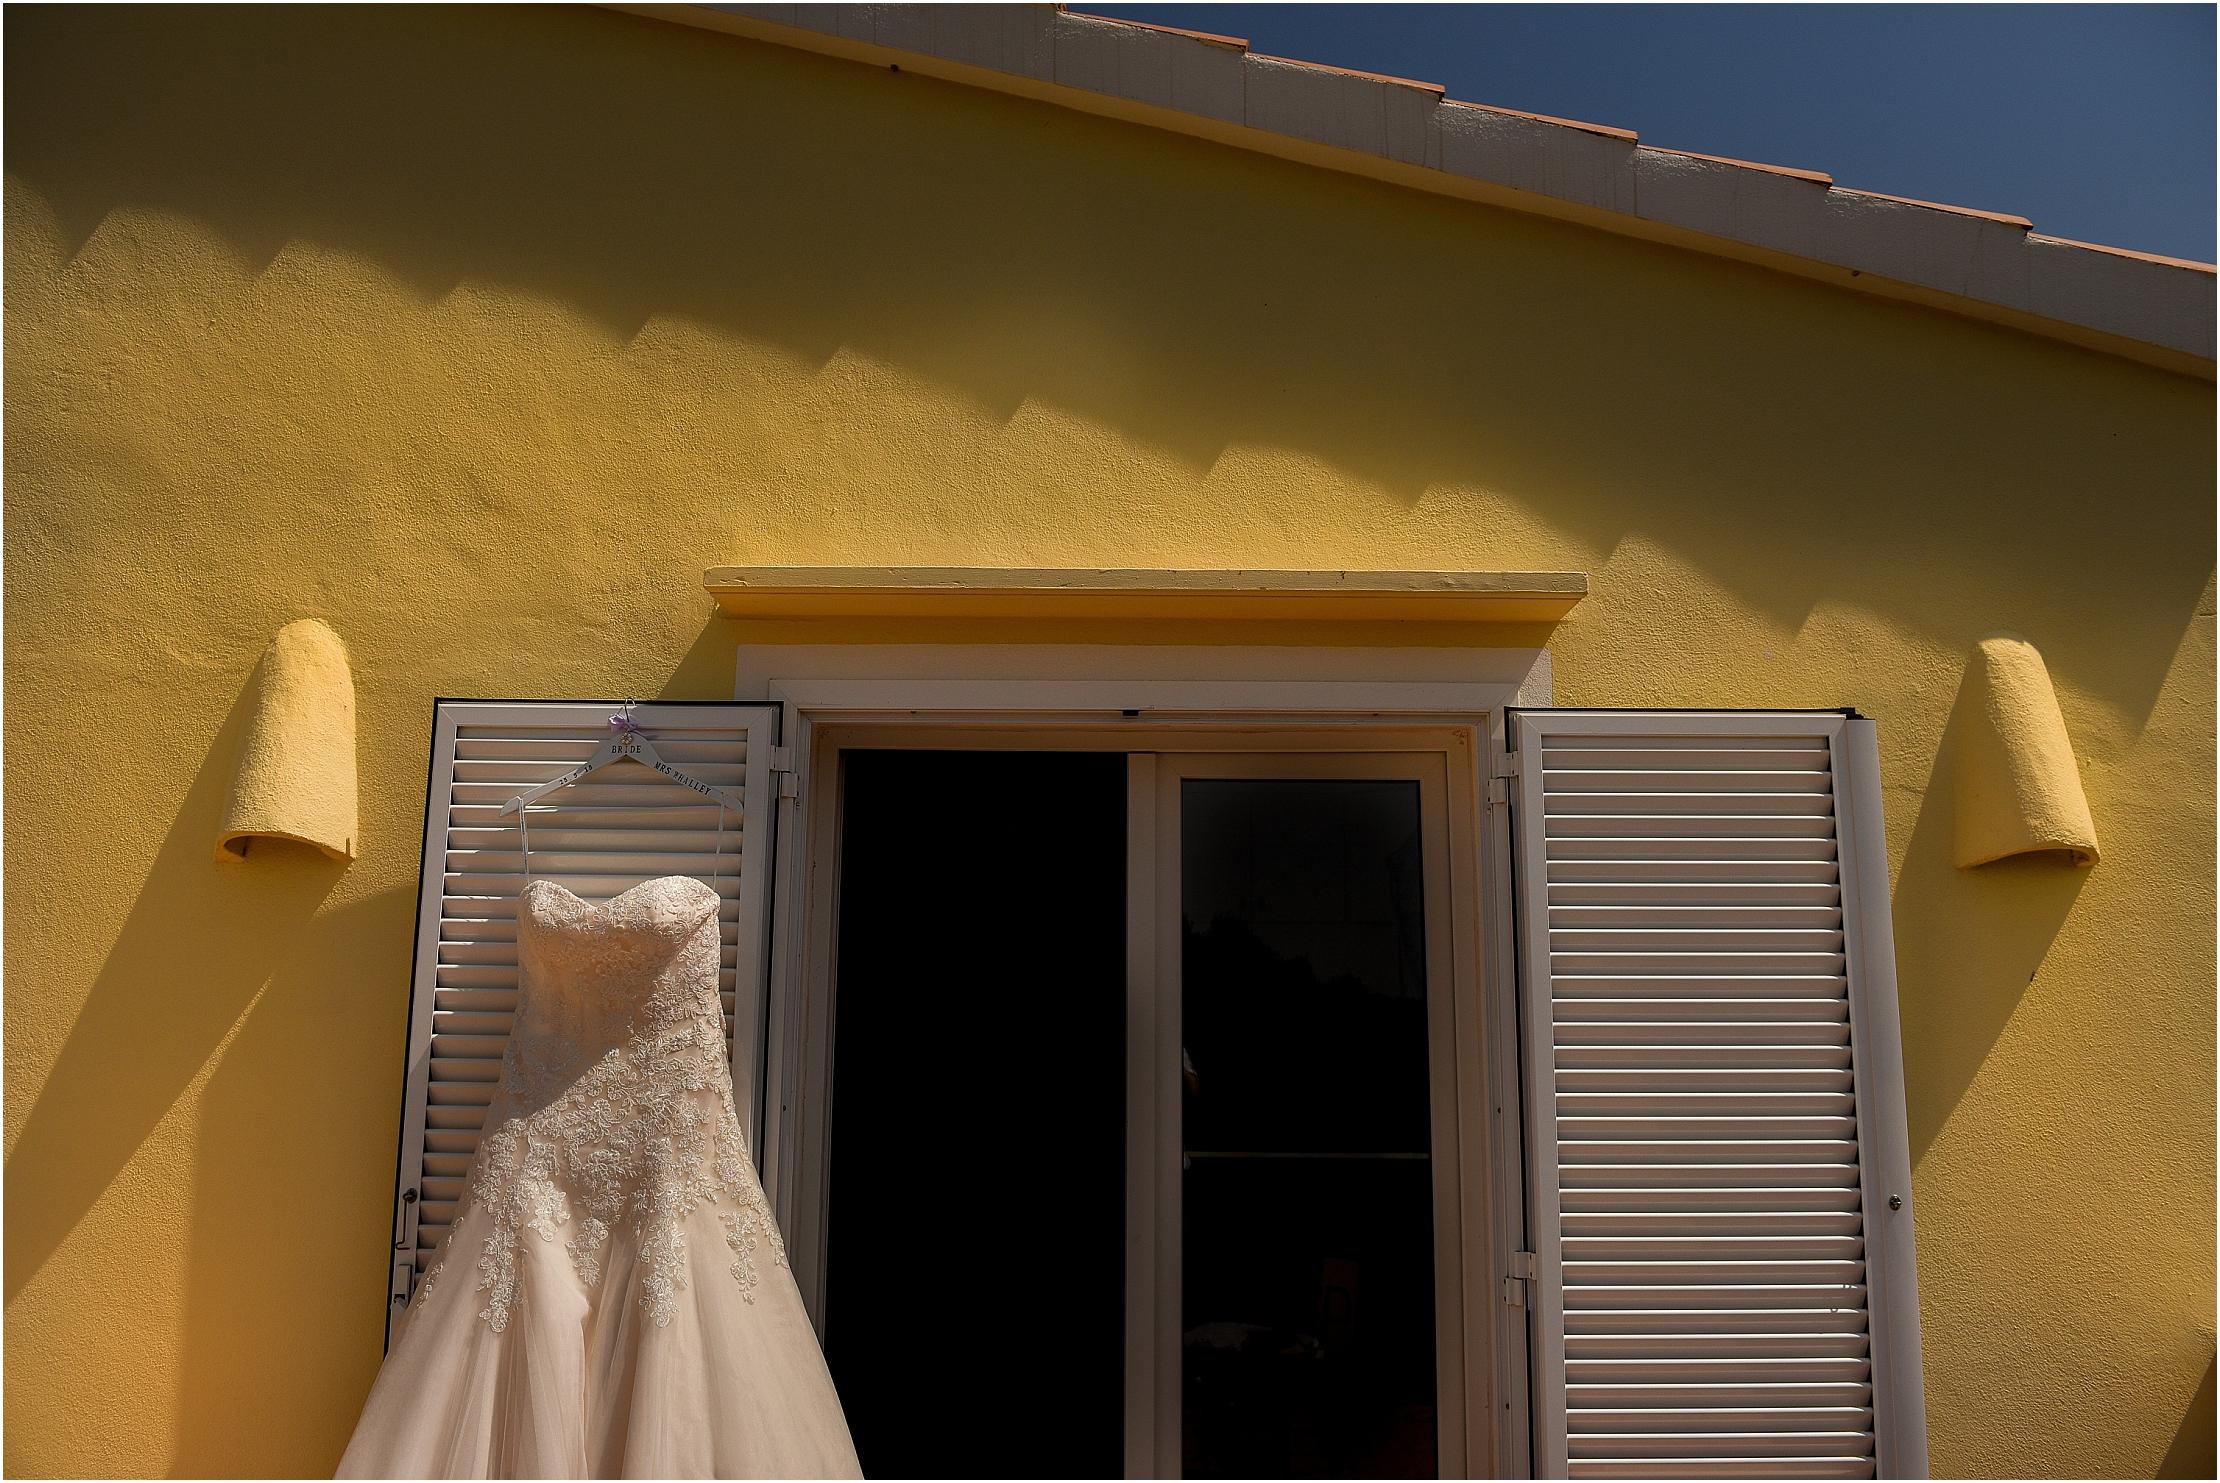 menorca-wedding - 058.jpg